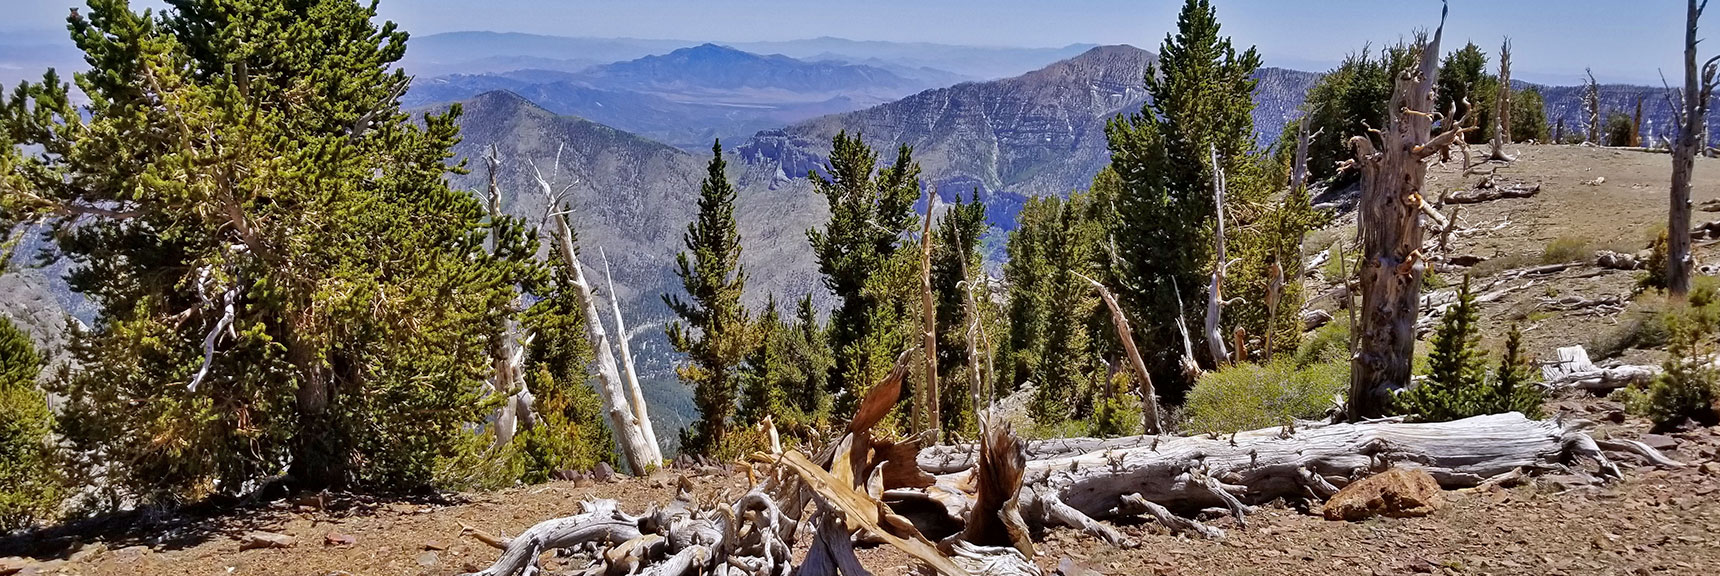 View Toward Harris Mountain, Griffith Peak and Saddle   Mummy Mountain Nevada Northeast Approach